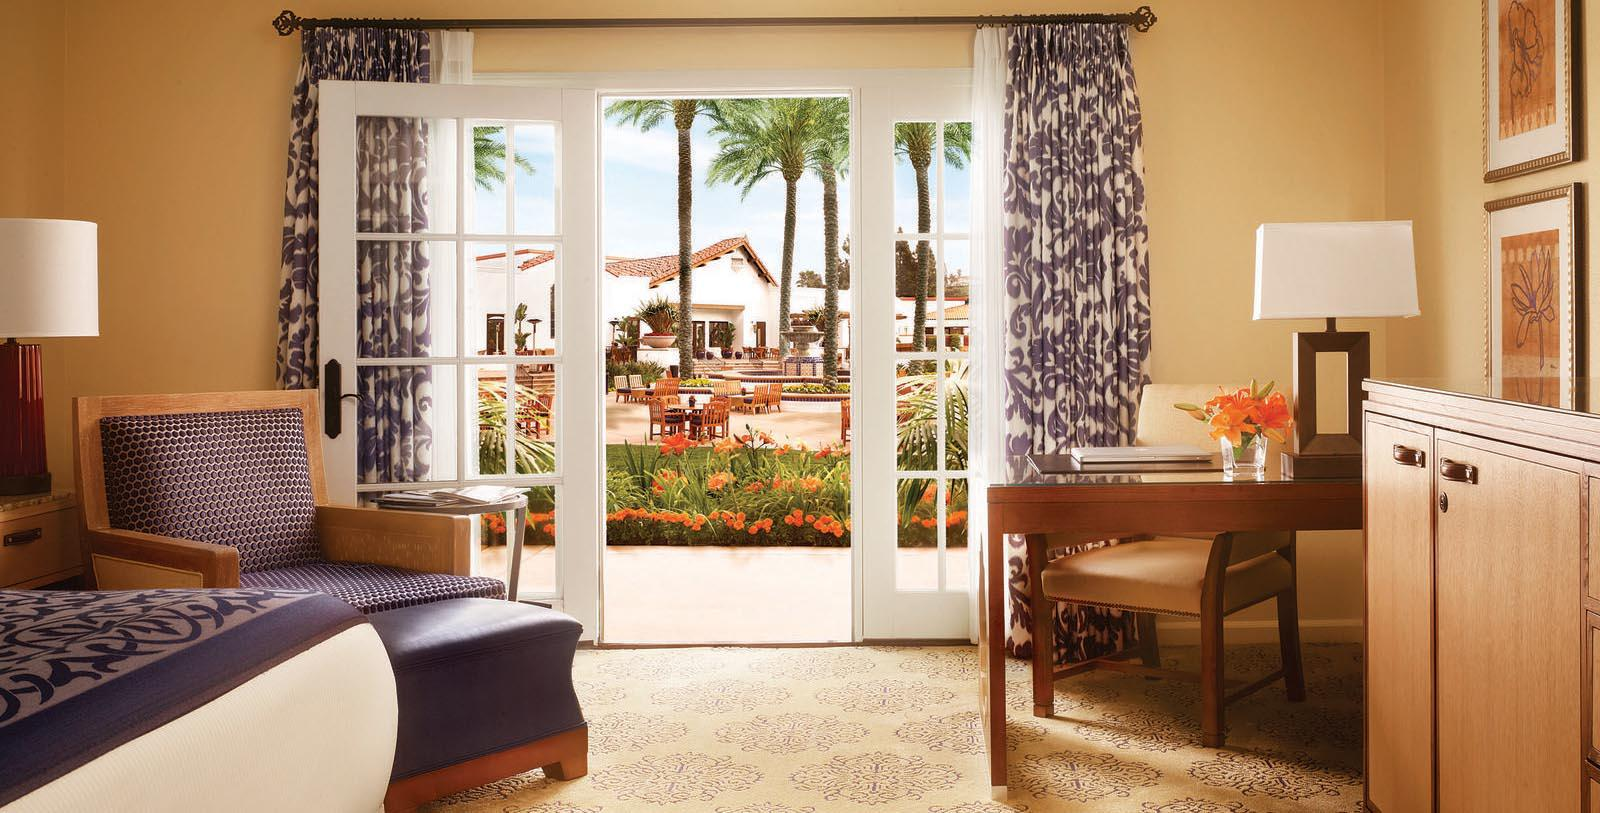 Image of Guestroom Interior & View, Omni La Costa Resort & Spa, Carlsbad, California, 1965, Member of Historic Hotels of America, Accommodations